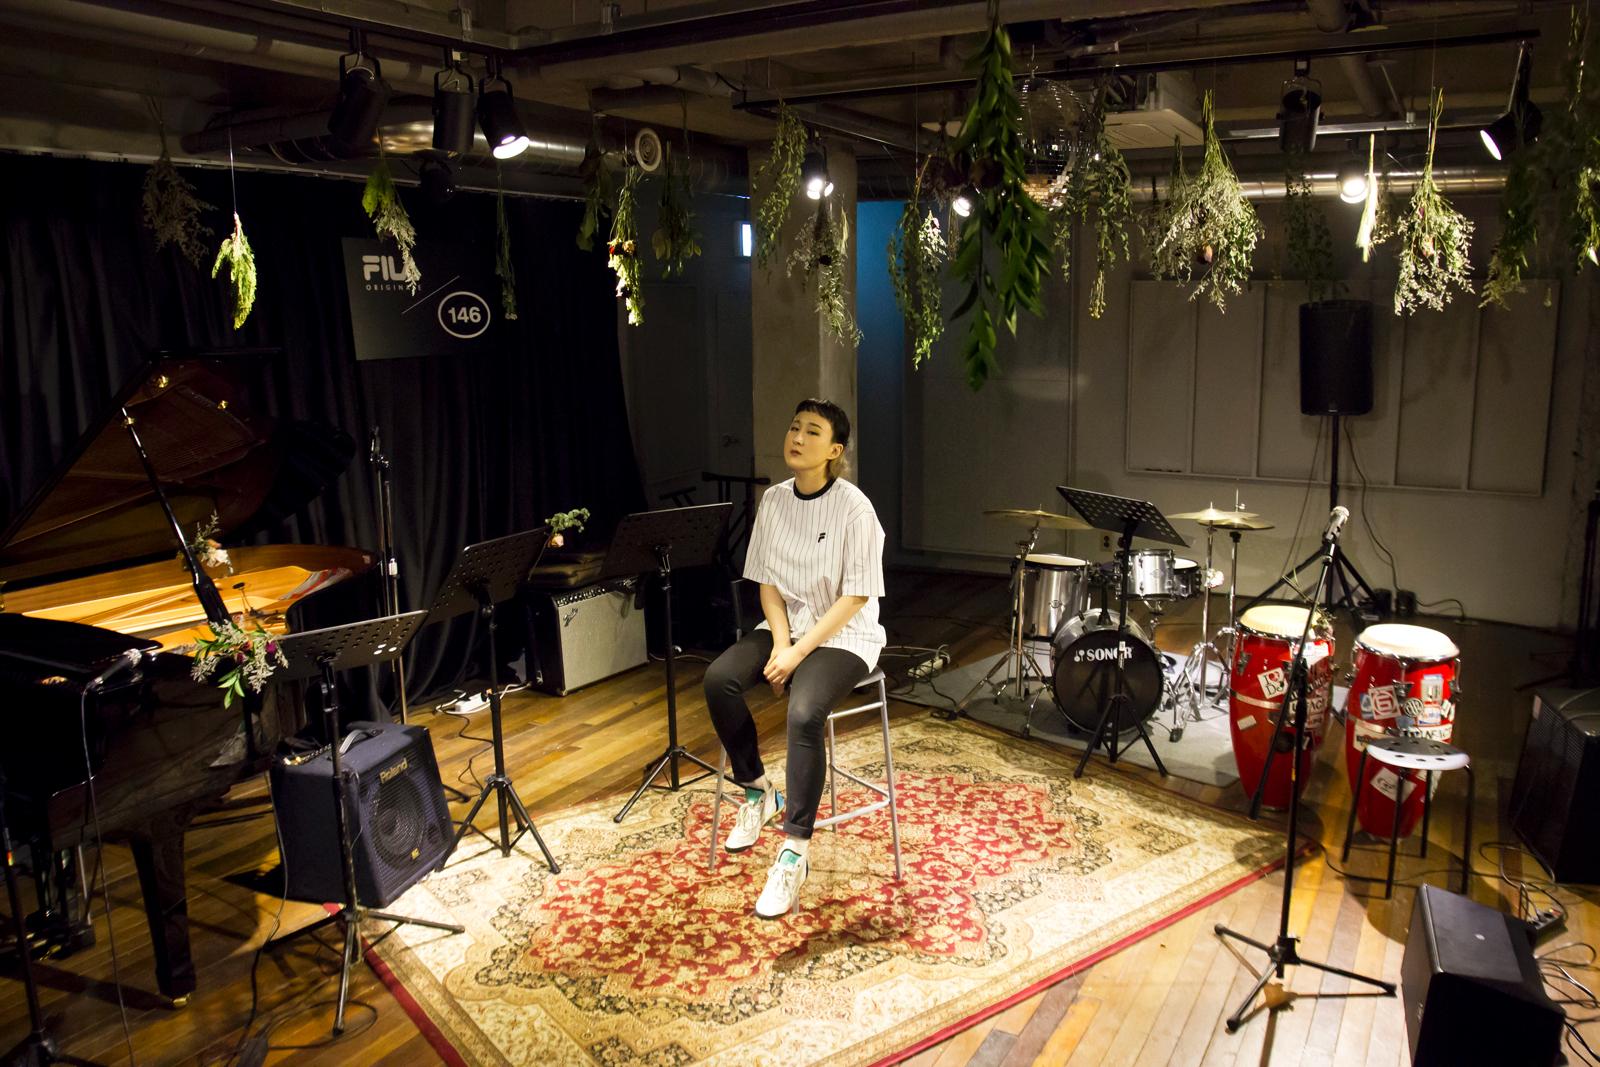 Interview: 선우정아 - Fila x 삼청동 146 'Ground...